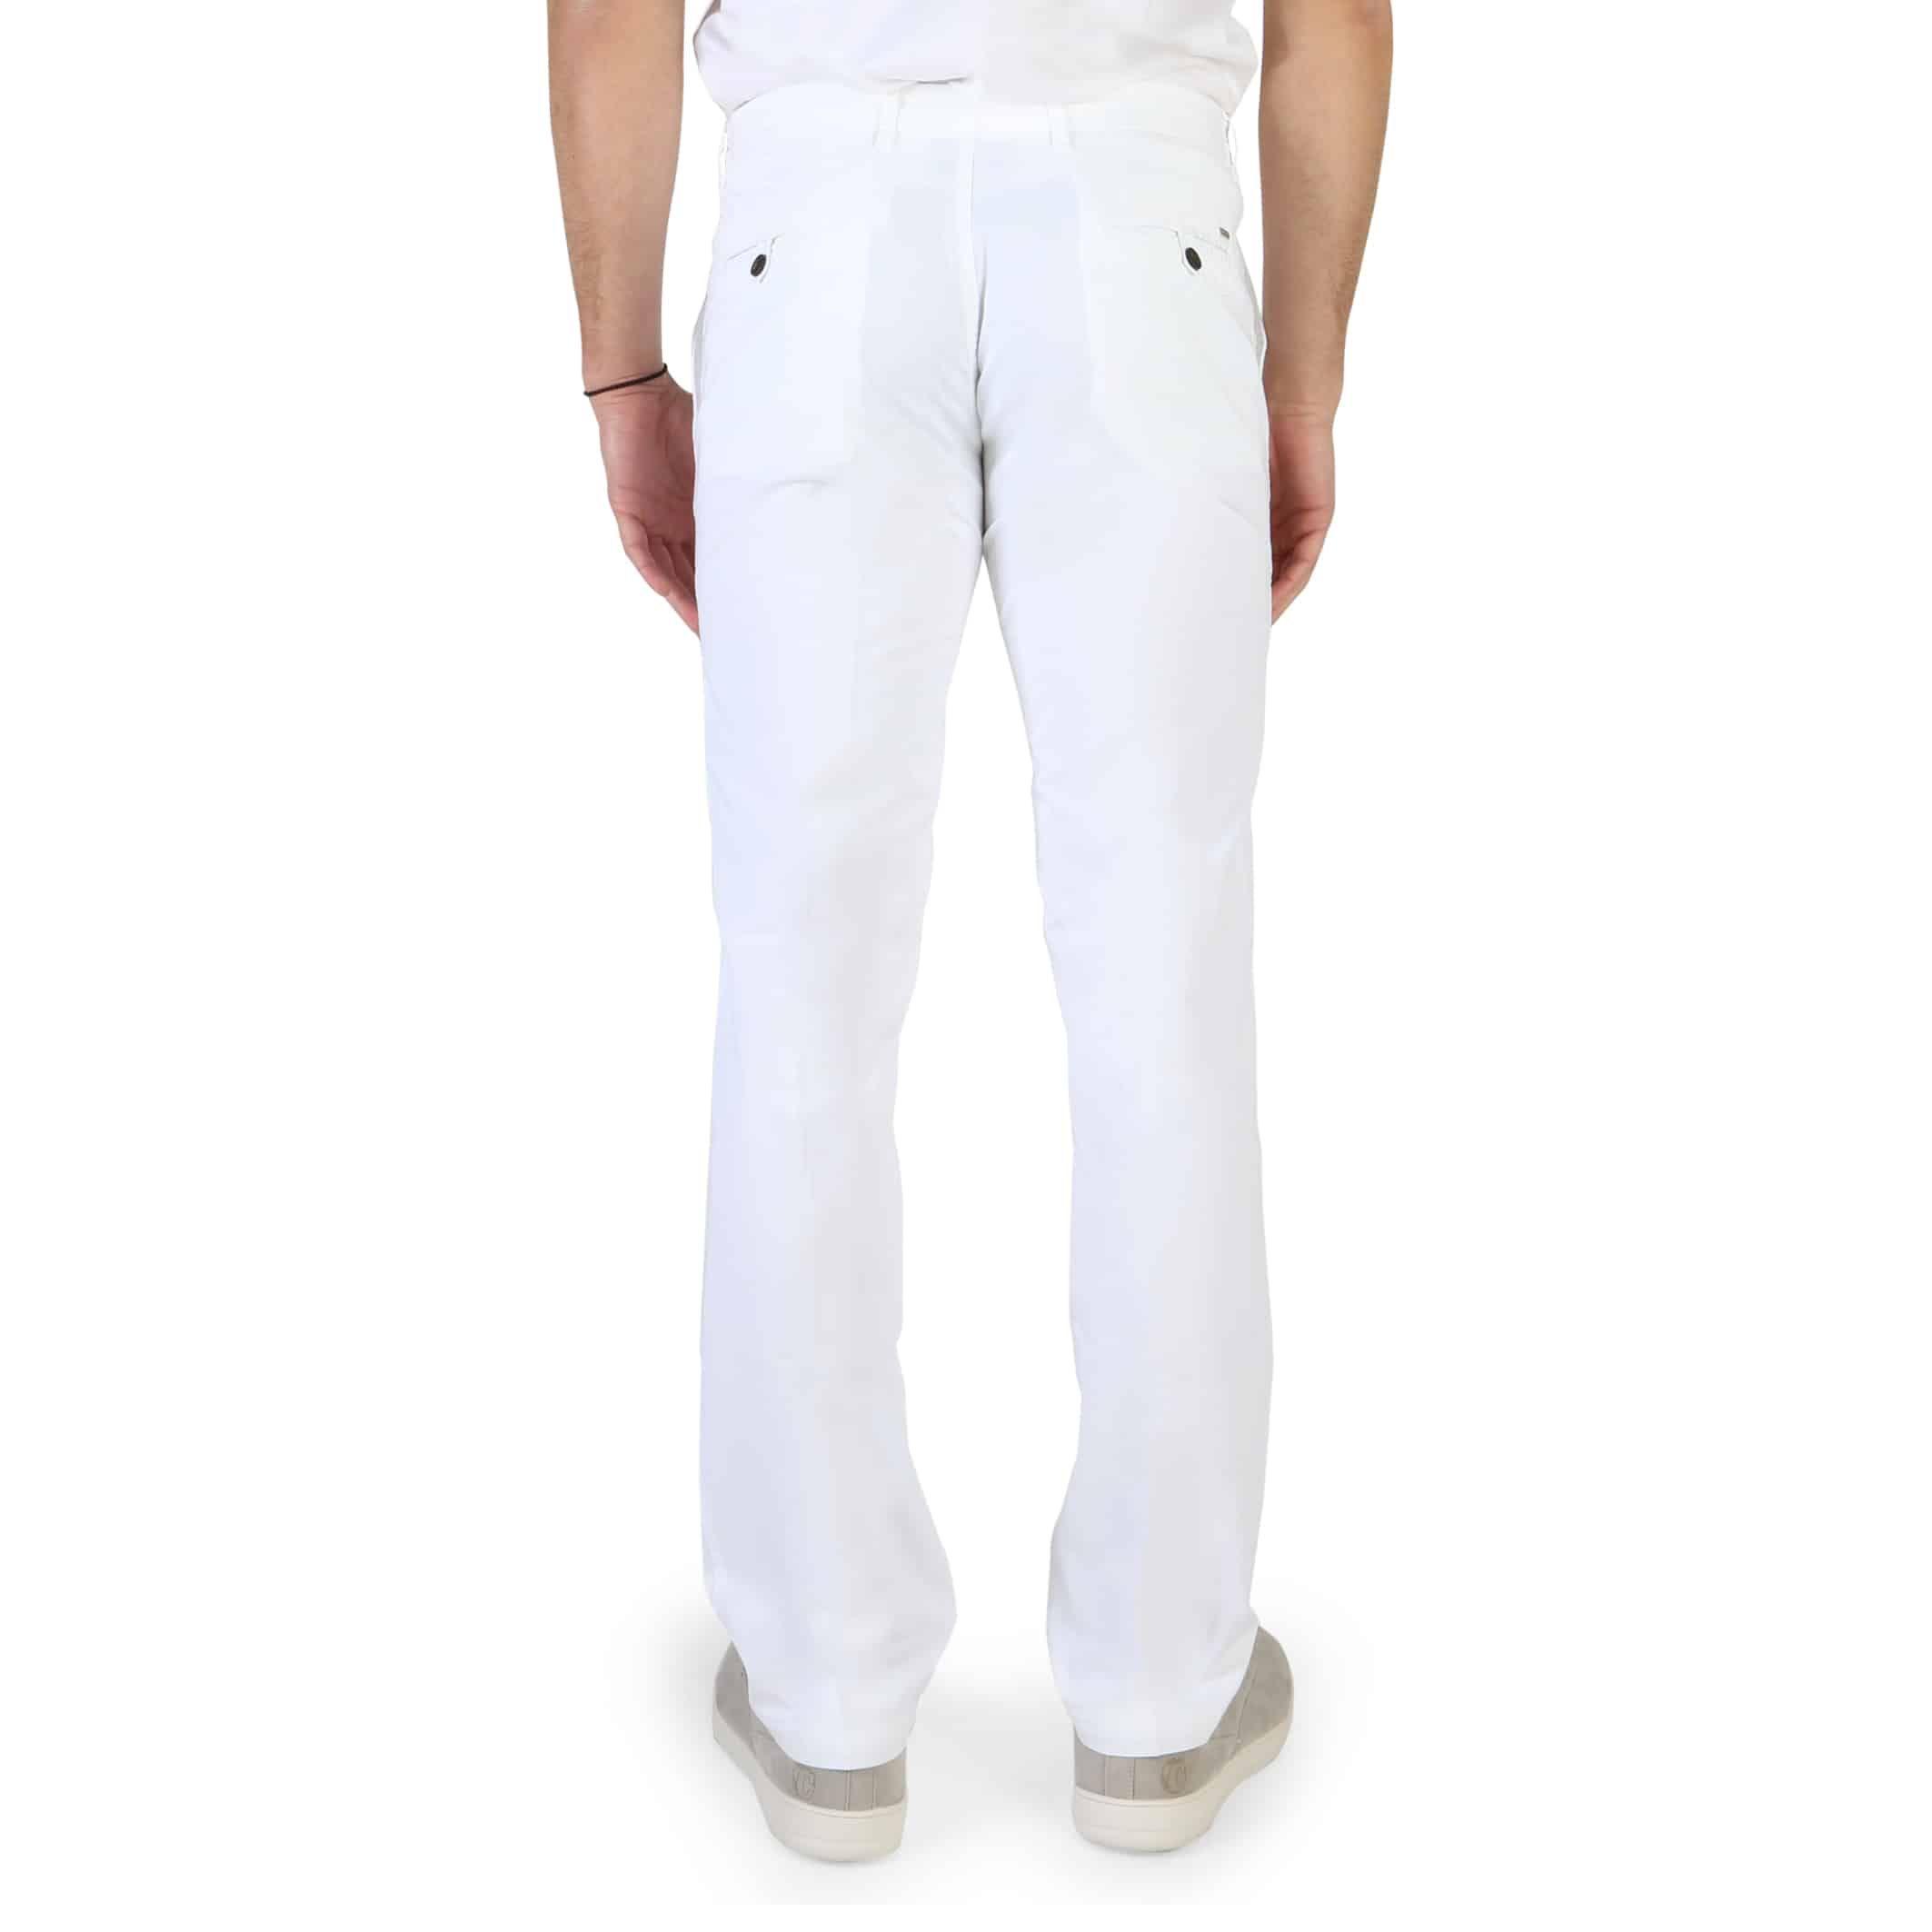 Armani Jeans – 3Y6P73_6N21Z – Bianco